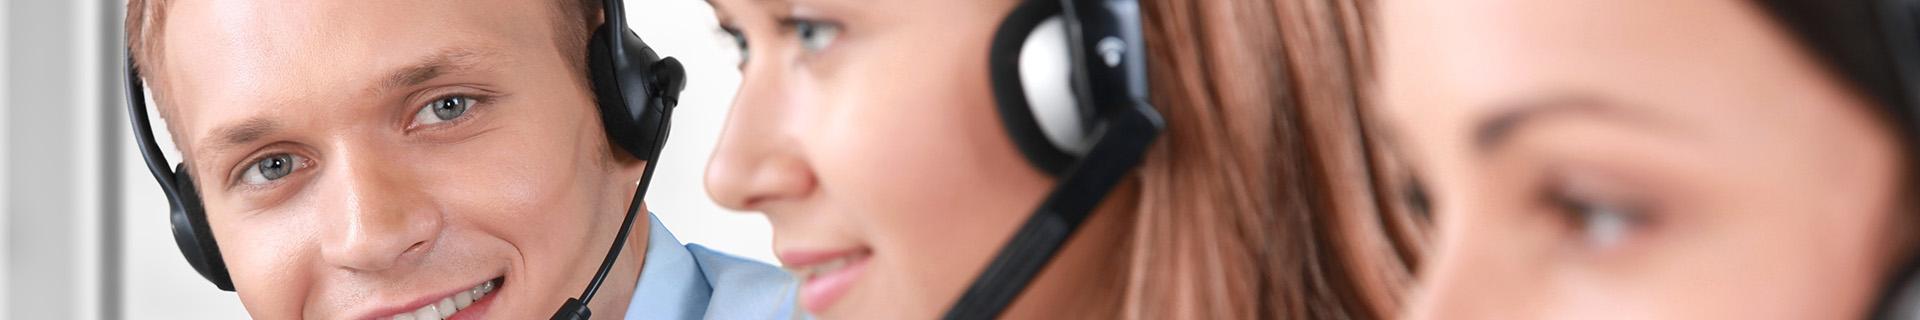 Customer service representitives smiling at work